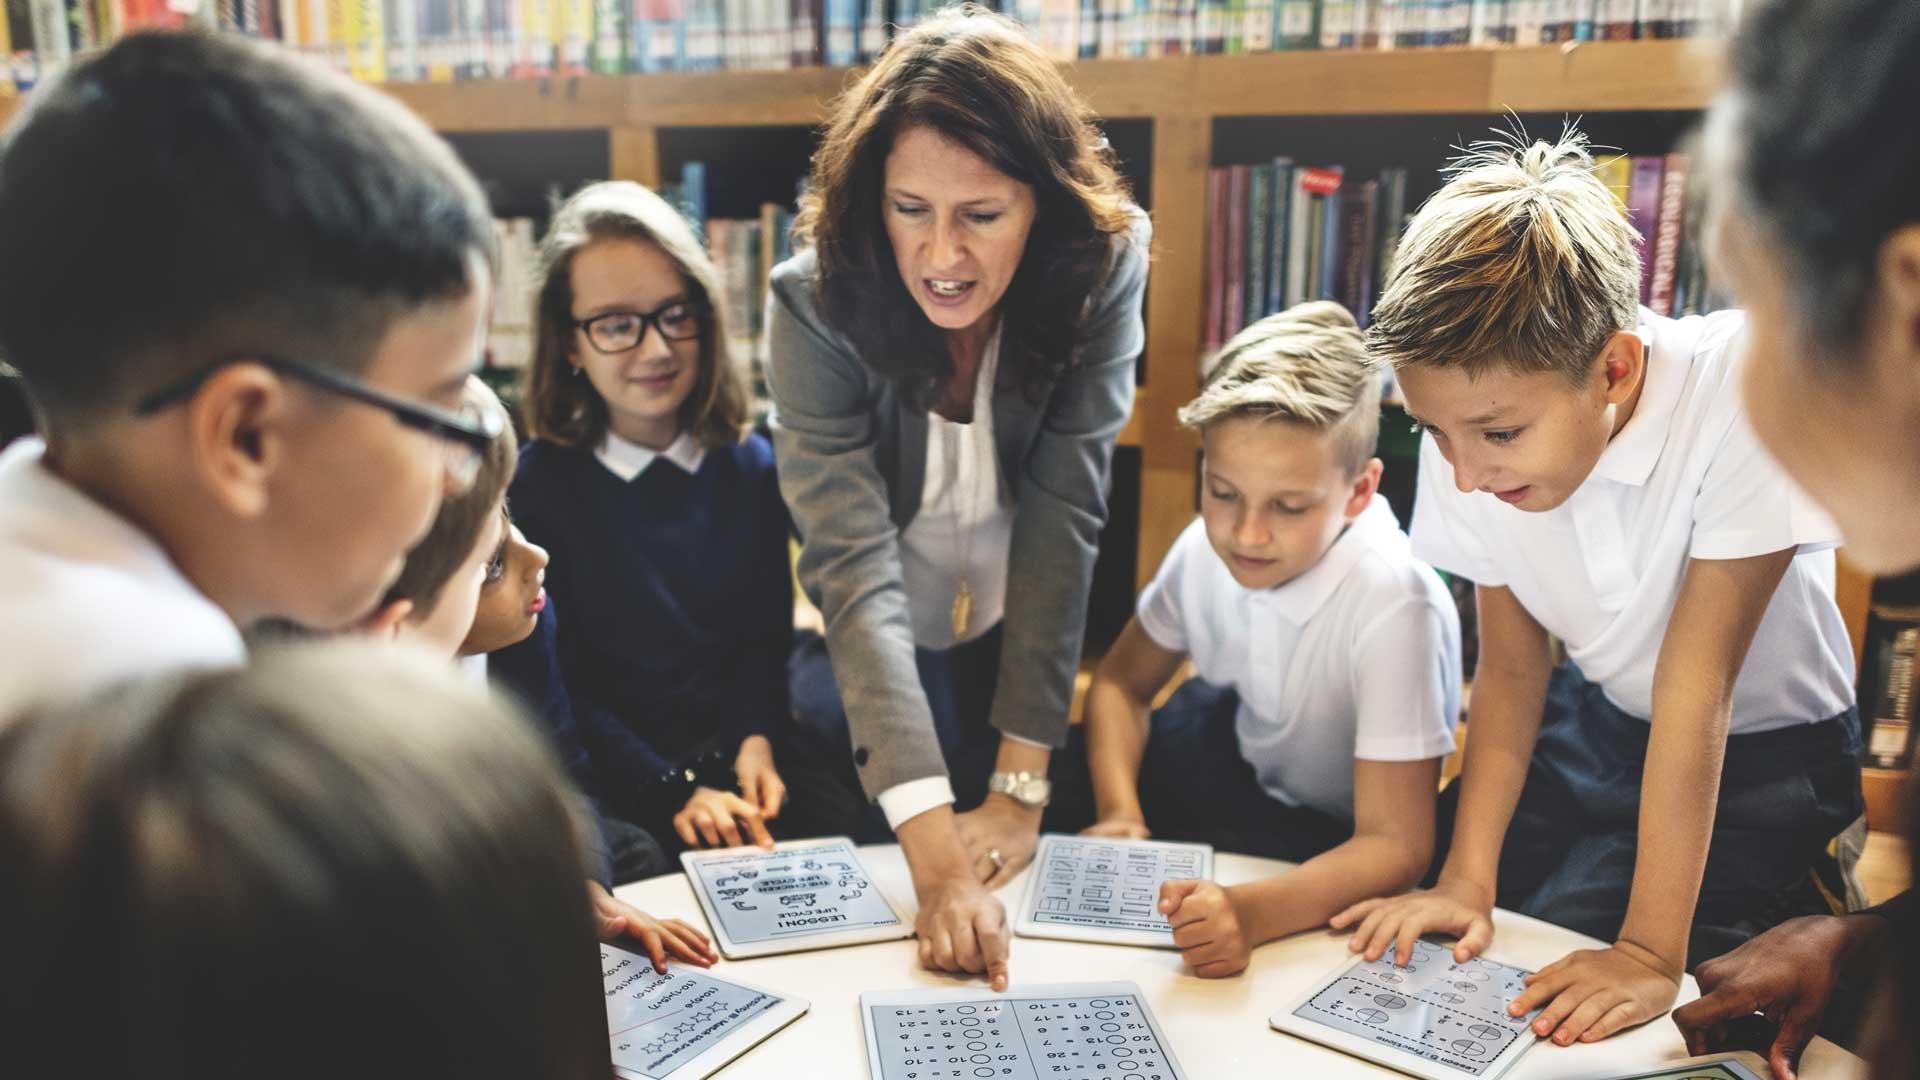 School-children-learning-skills-for-work-with-teacher-ipads.jpg